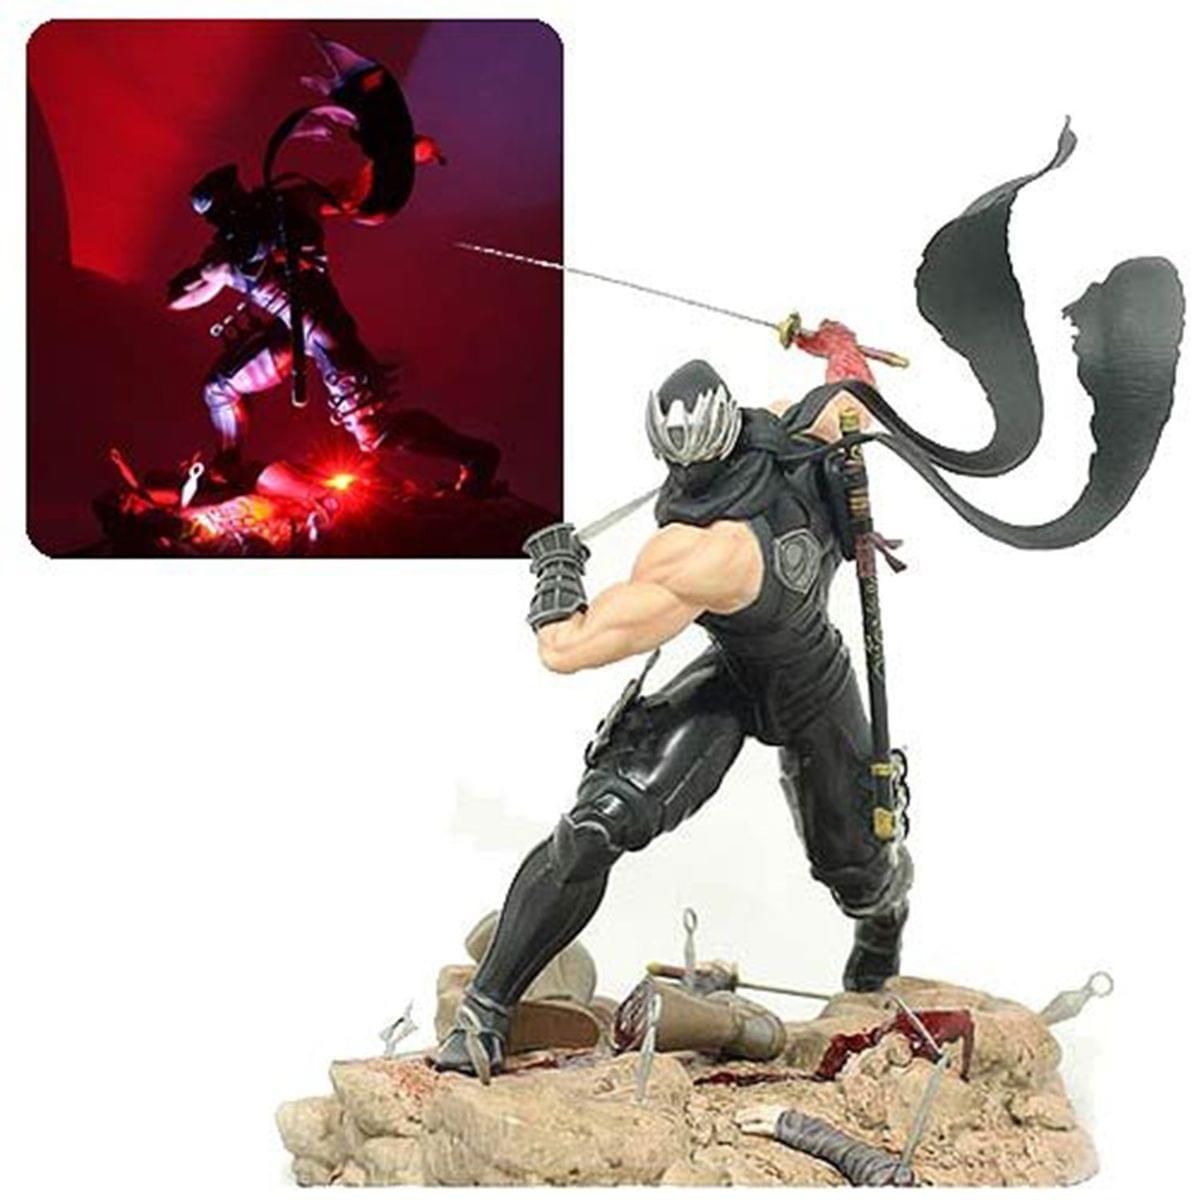 Details About Ninja Gaiden 3 Ryu Hayabusa 13 Resin Statue Bludgeoning Staff Variant